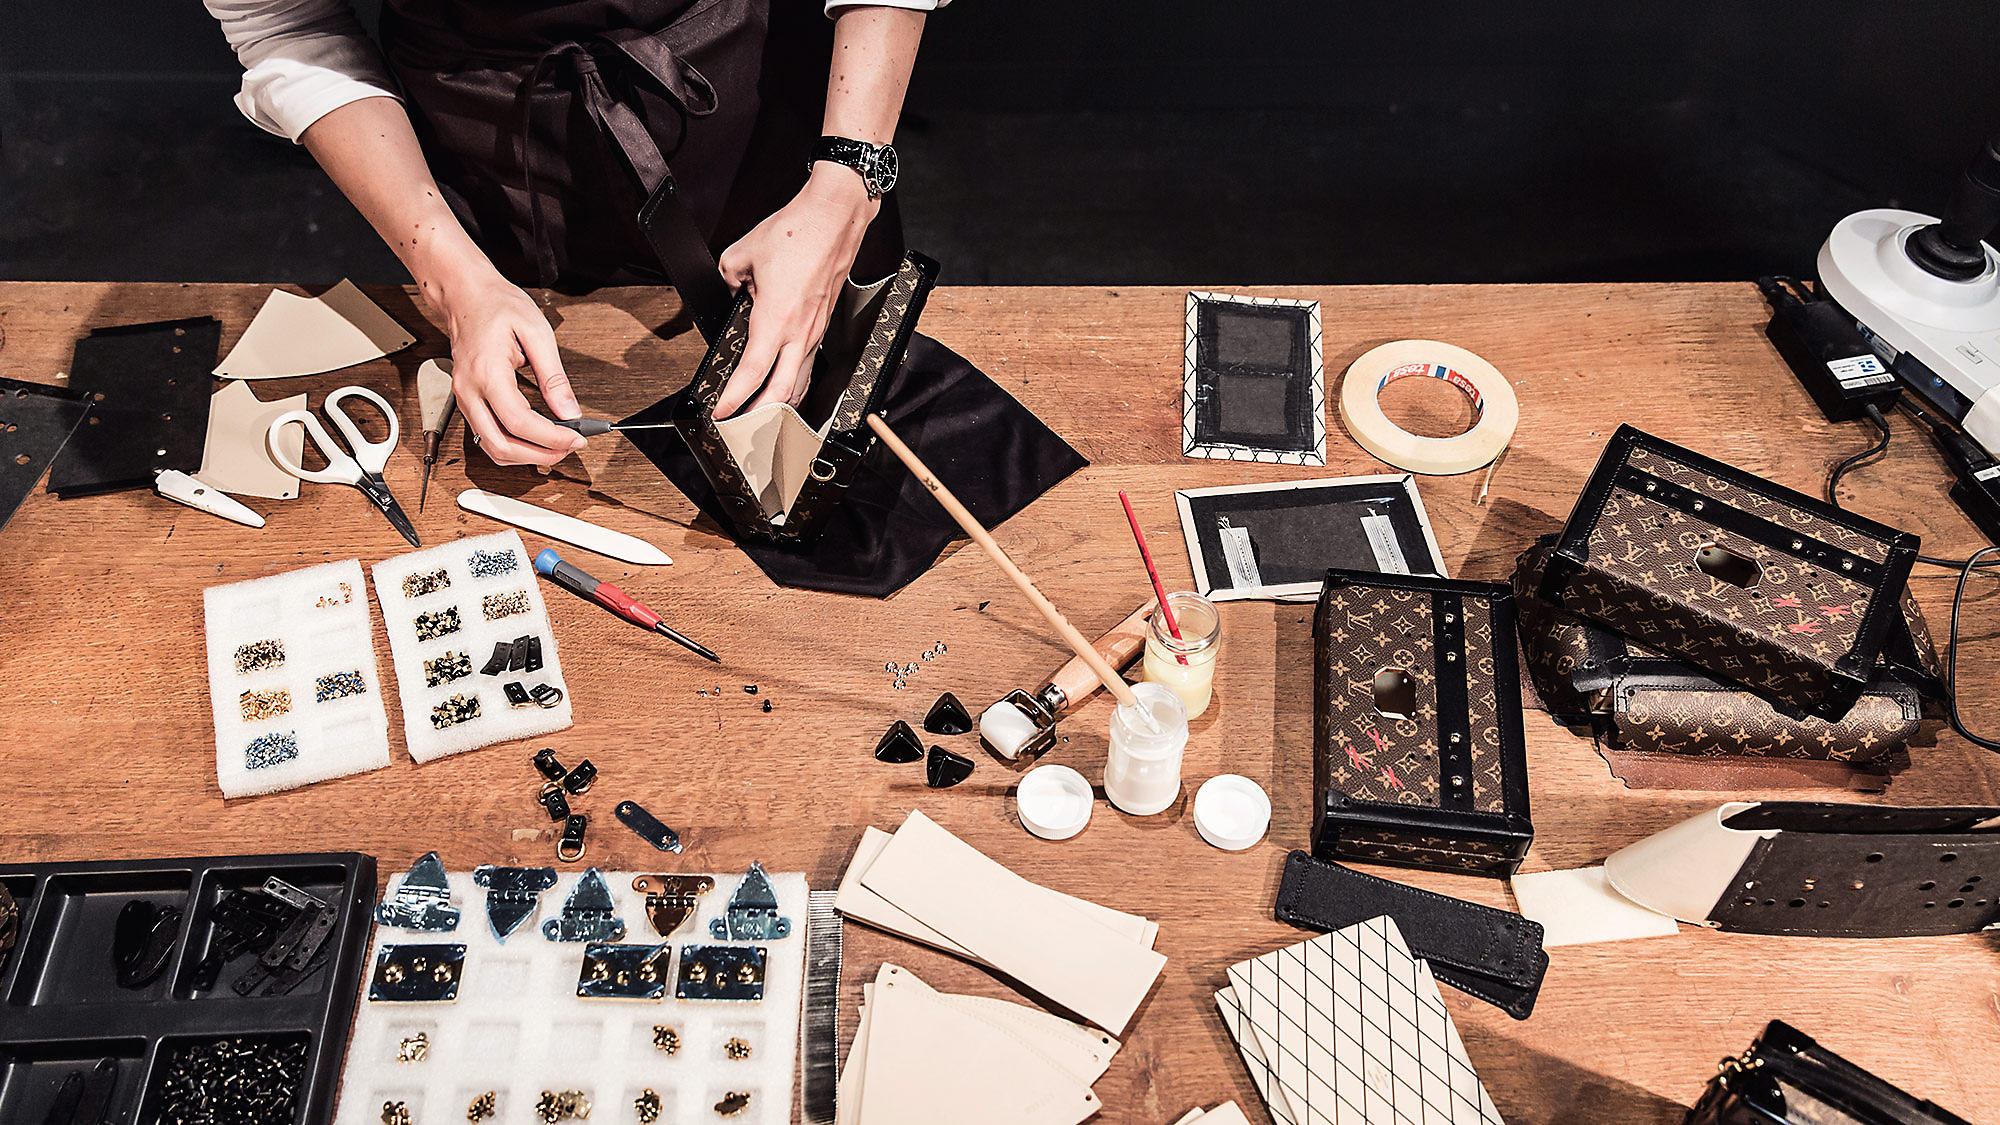 Sant hantverk. Bild: Louis Vuitton